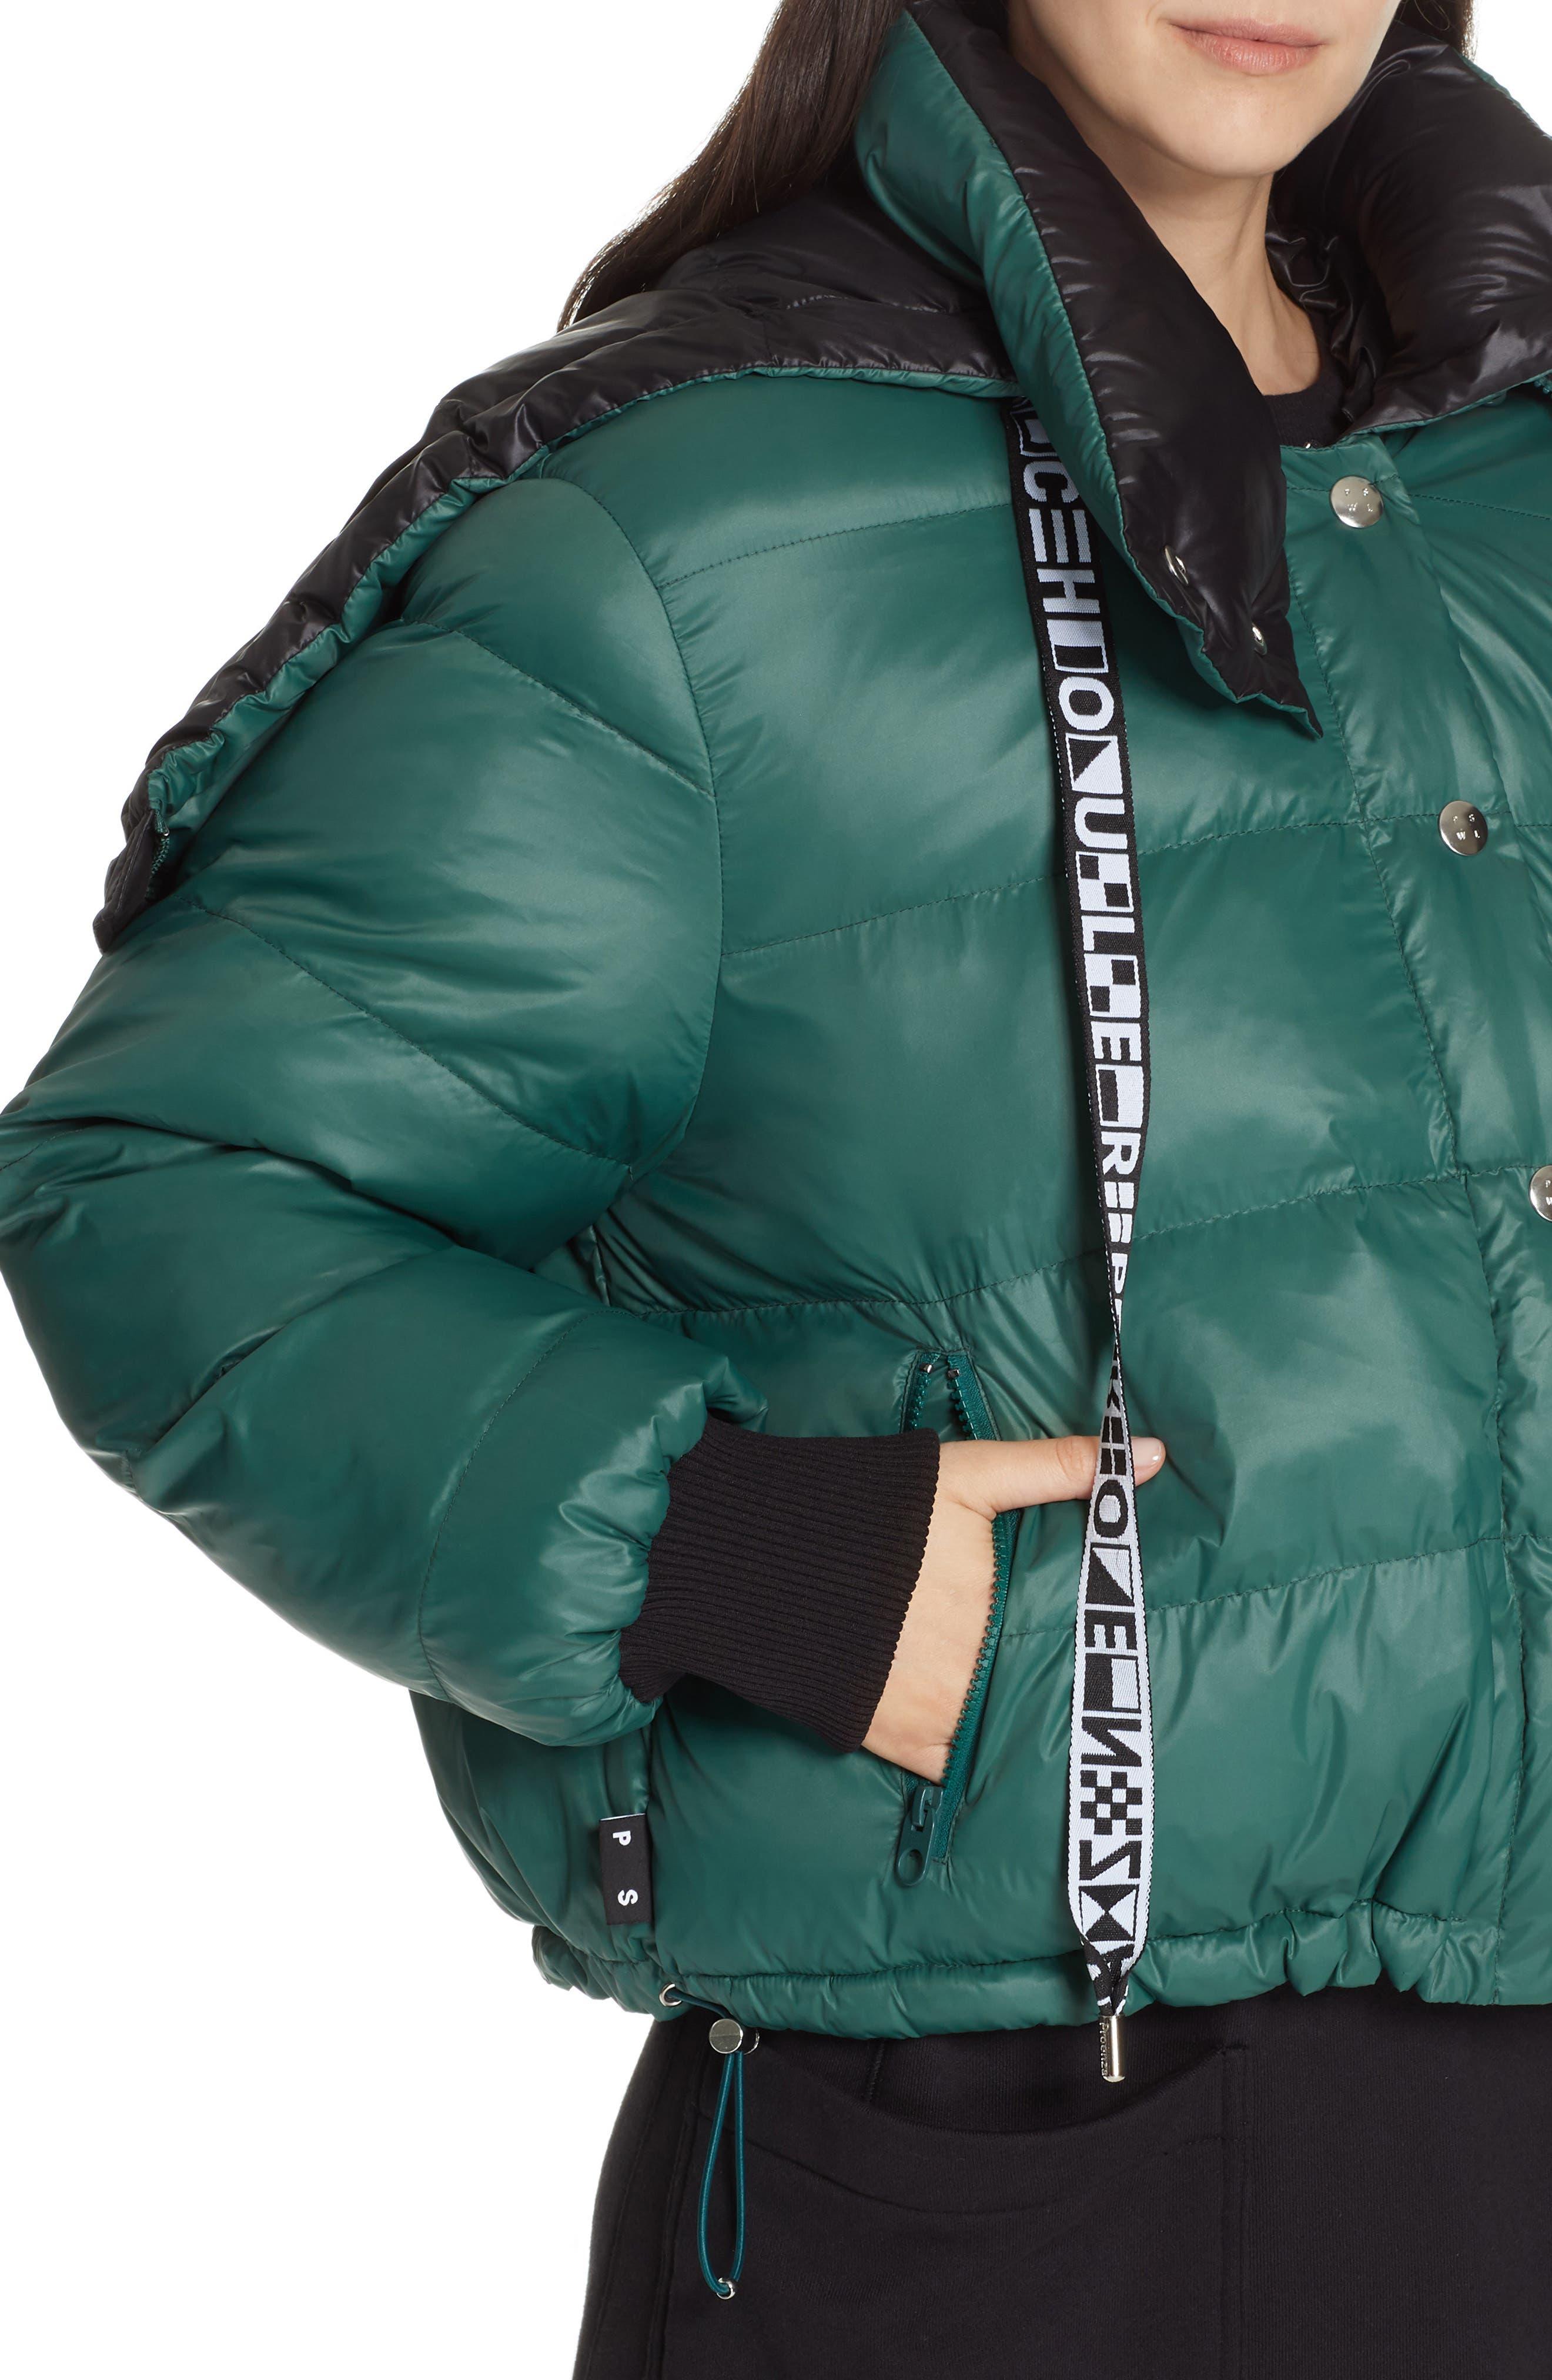 PROENZA SCHOULER, PSWL Reversible Puffer Coat, Alternate thumbnail 6, color, GREEN/ BLACK